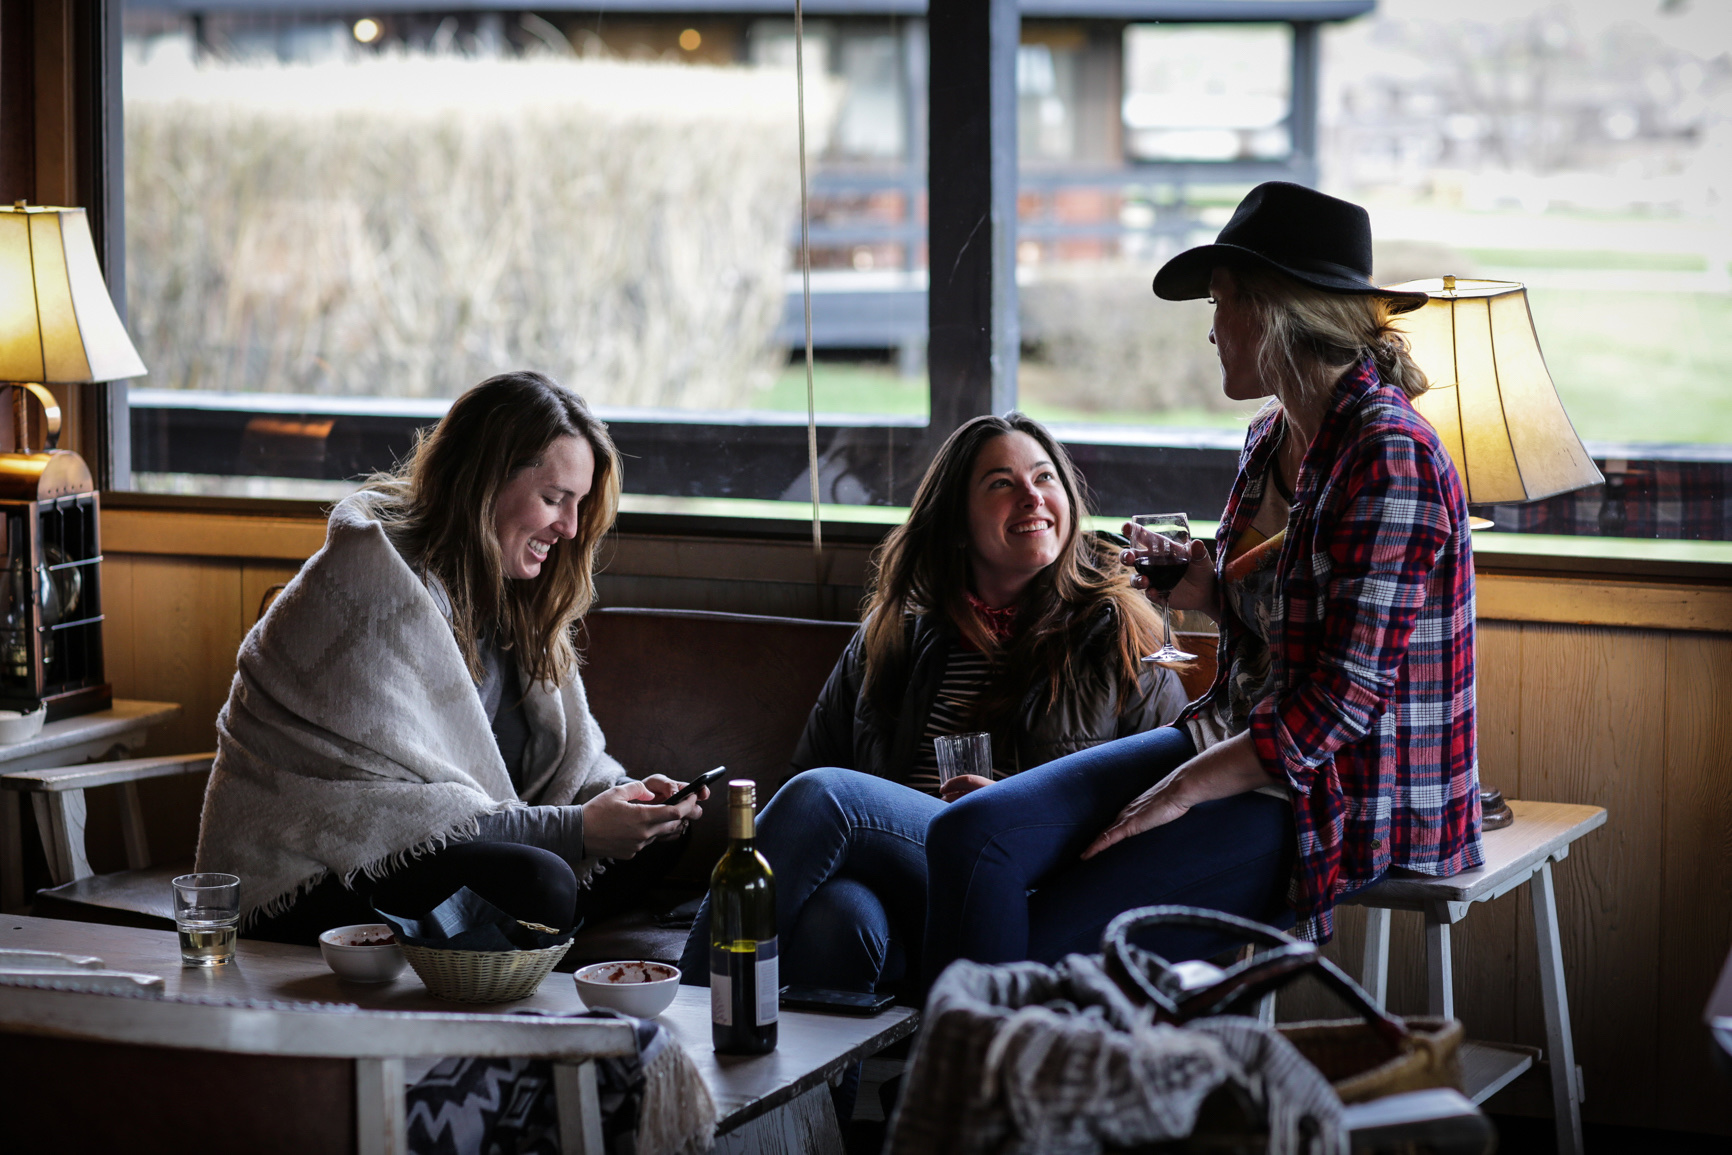 Sundance Ranch Soulful Entrepreneur Retreat interactive conversations